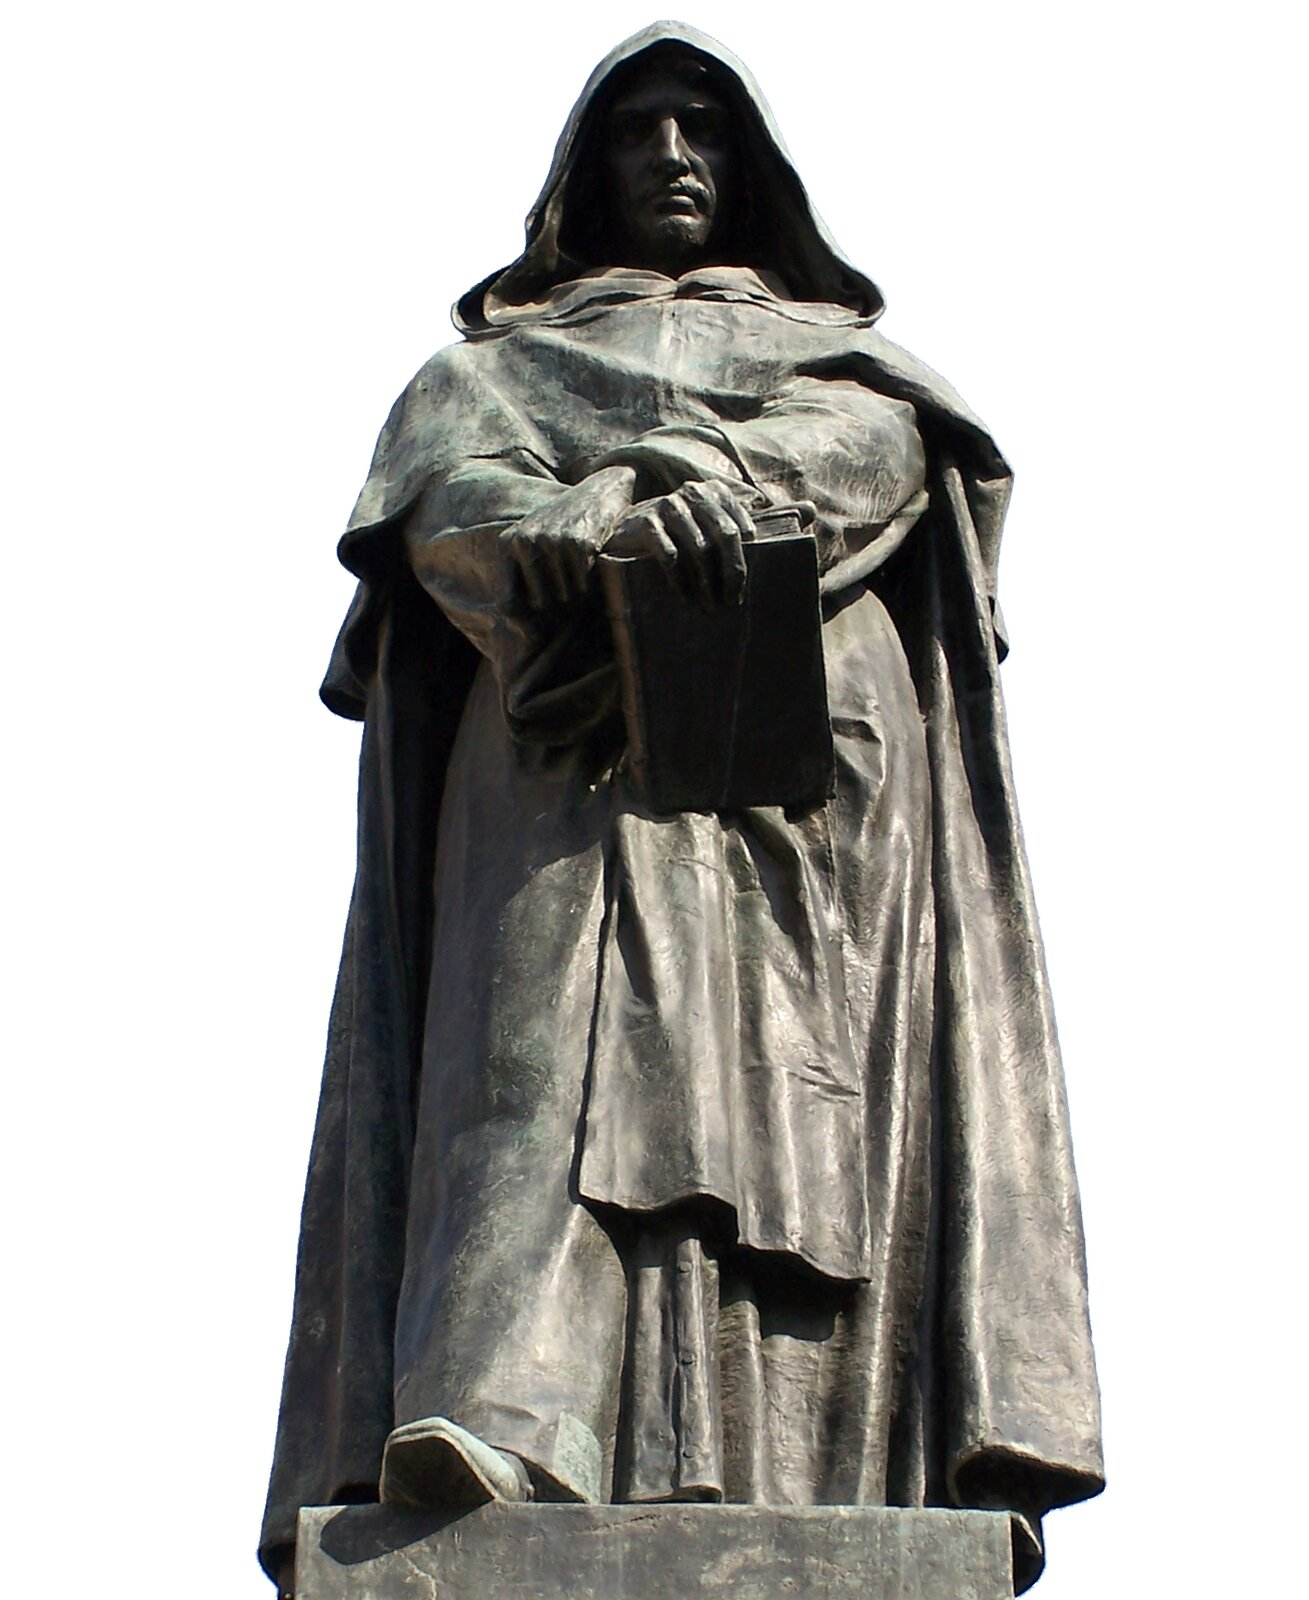 Giordano Bruno Giordano Bruno Źródło: Berthold Werner, licencja: CC BY 3.0.